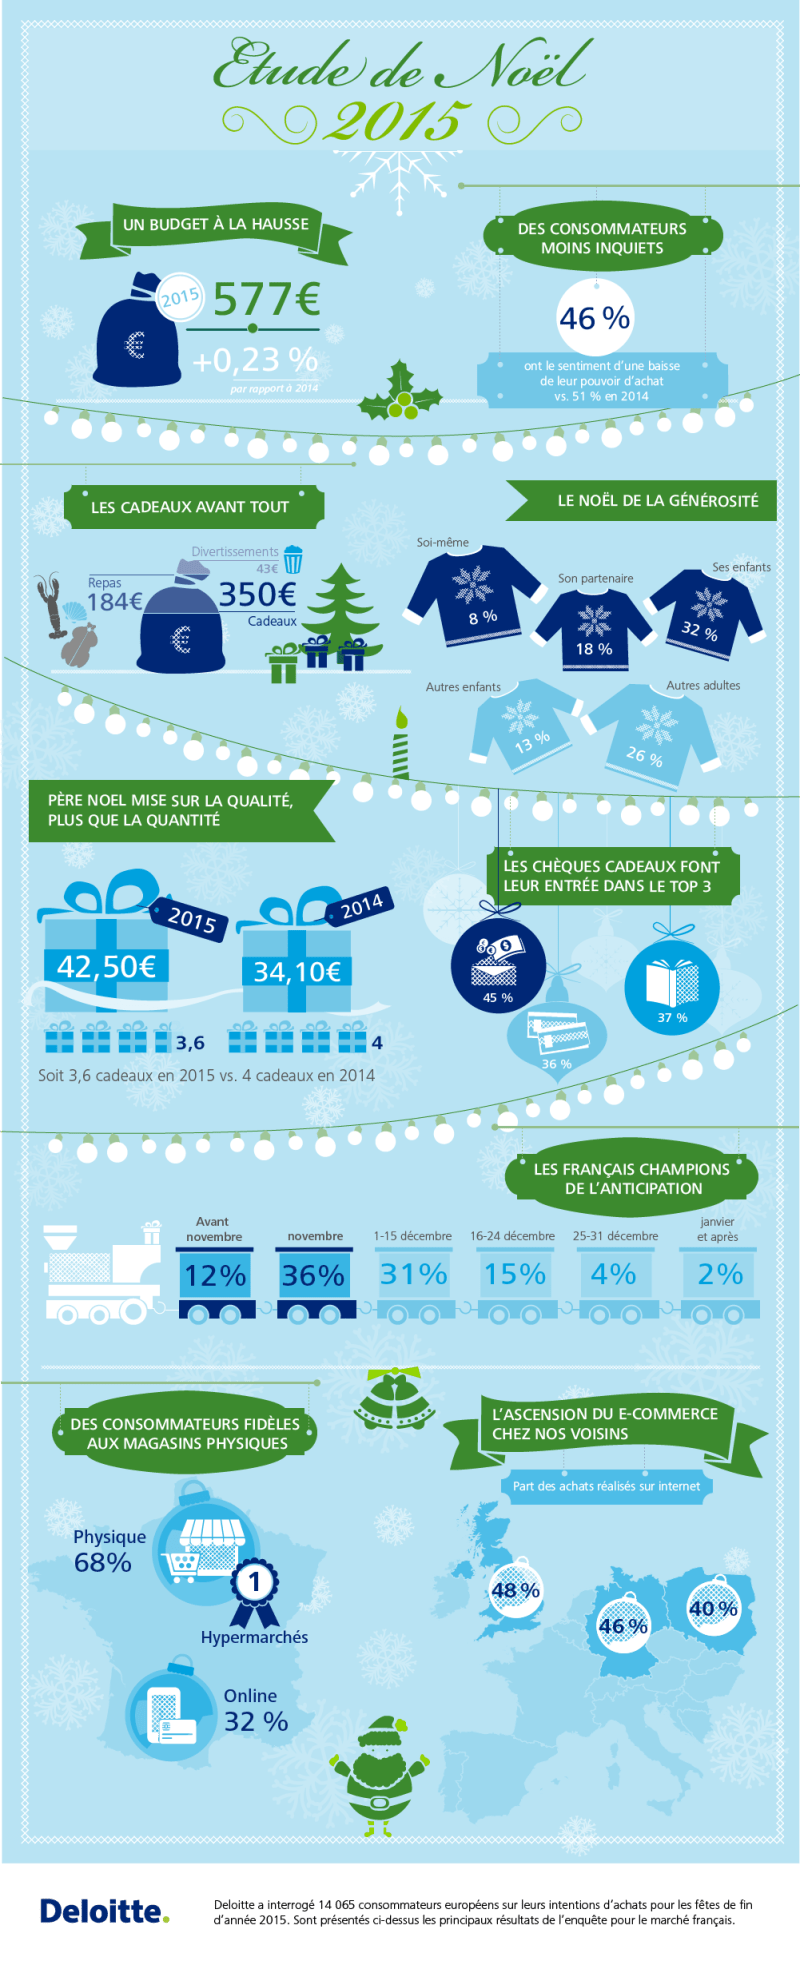 deloitte_etude-noel-2015_infographie